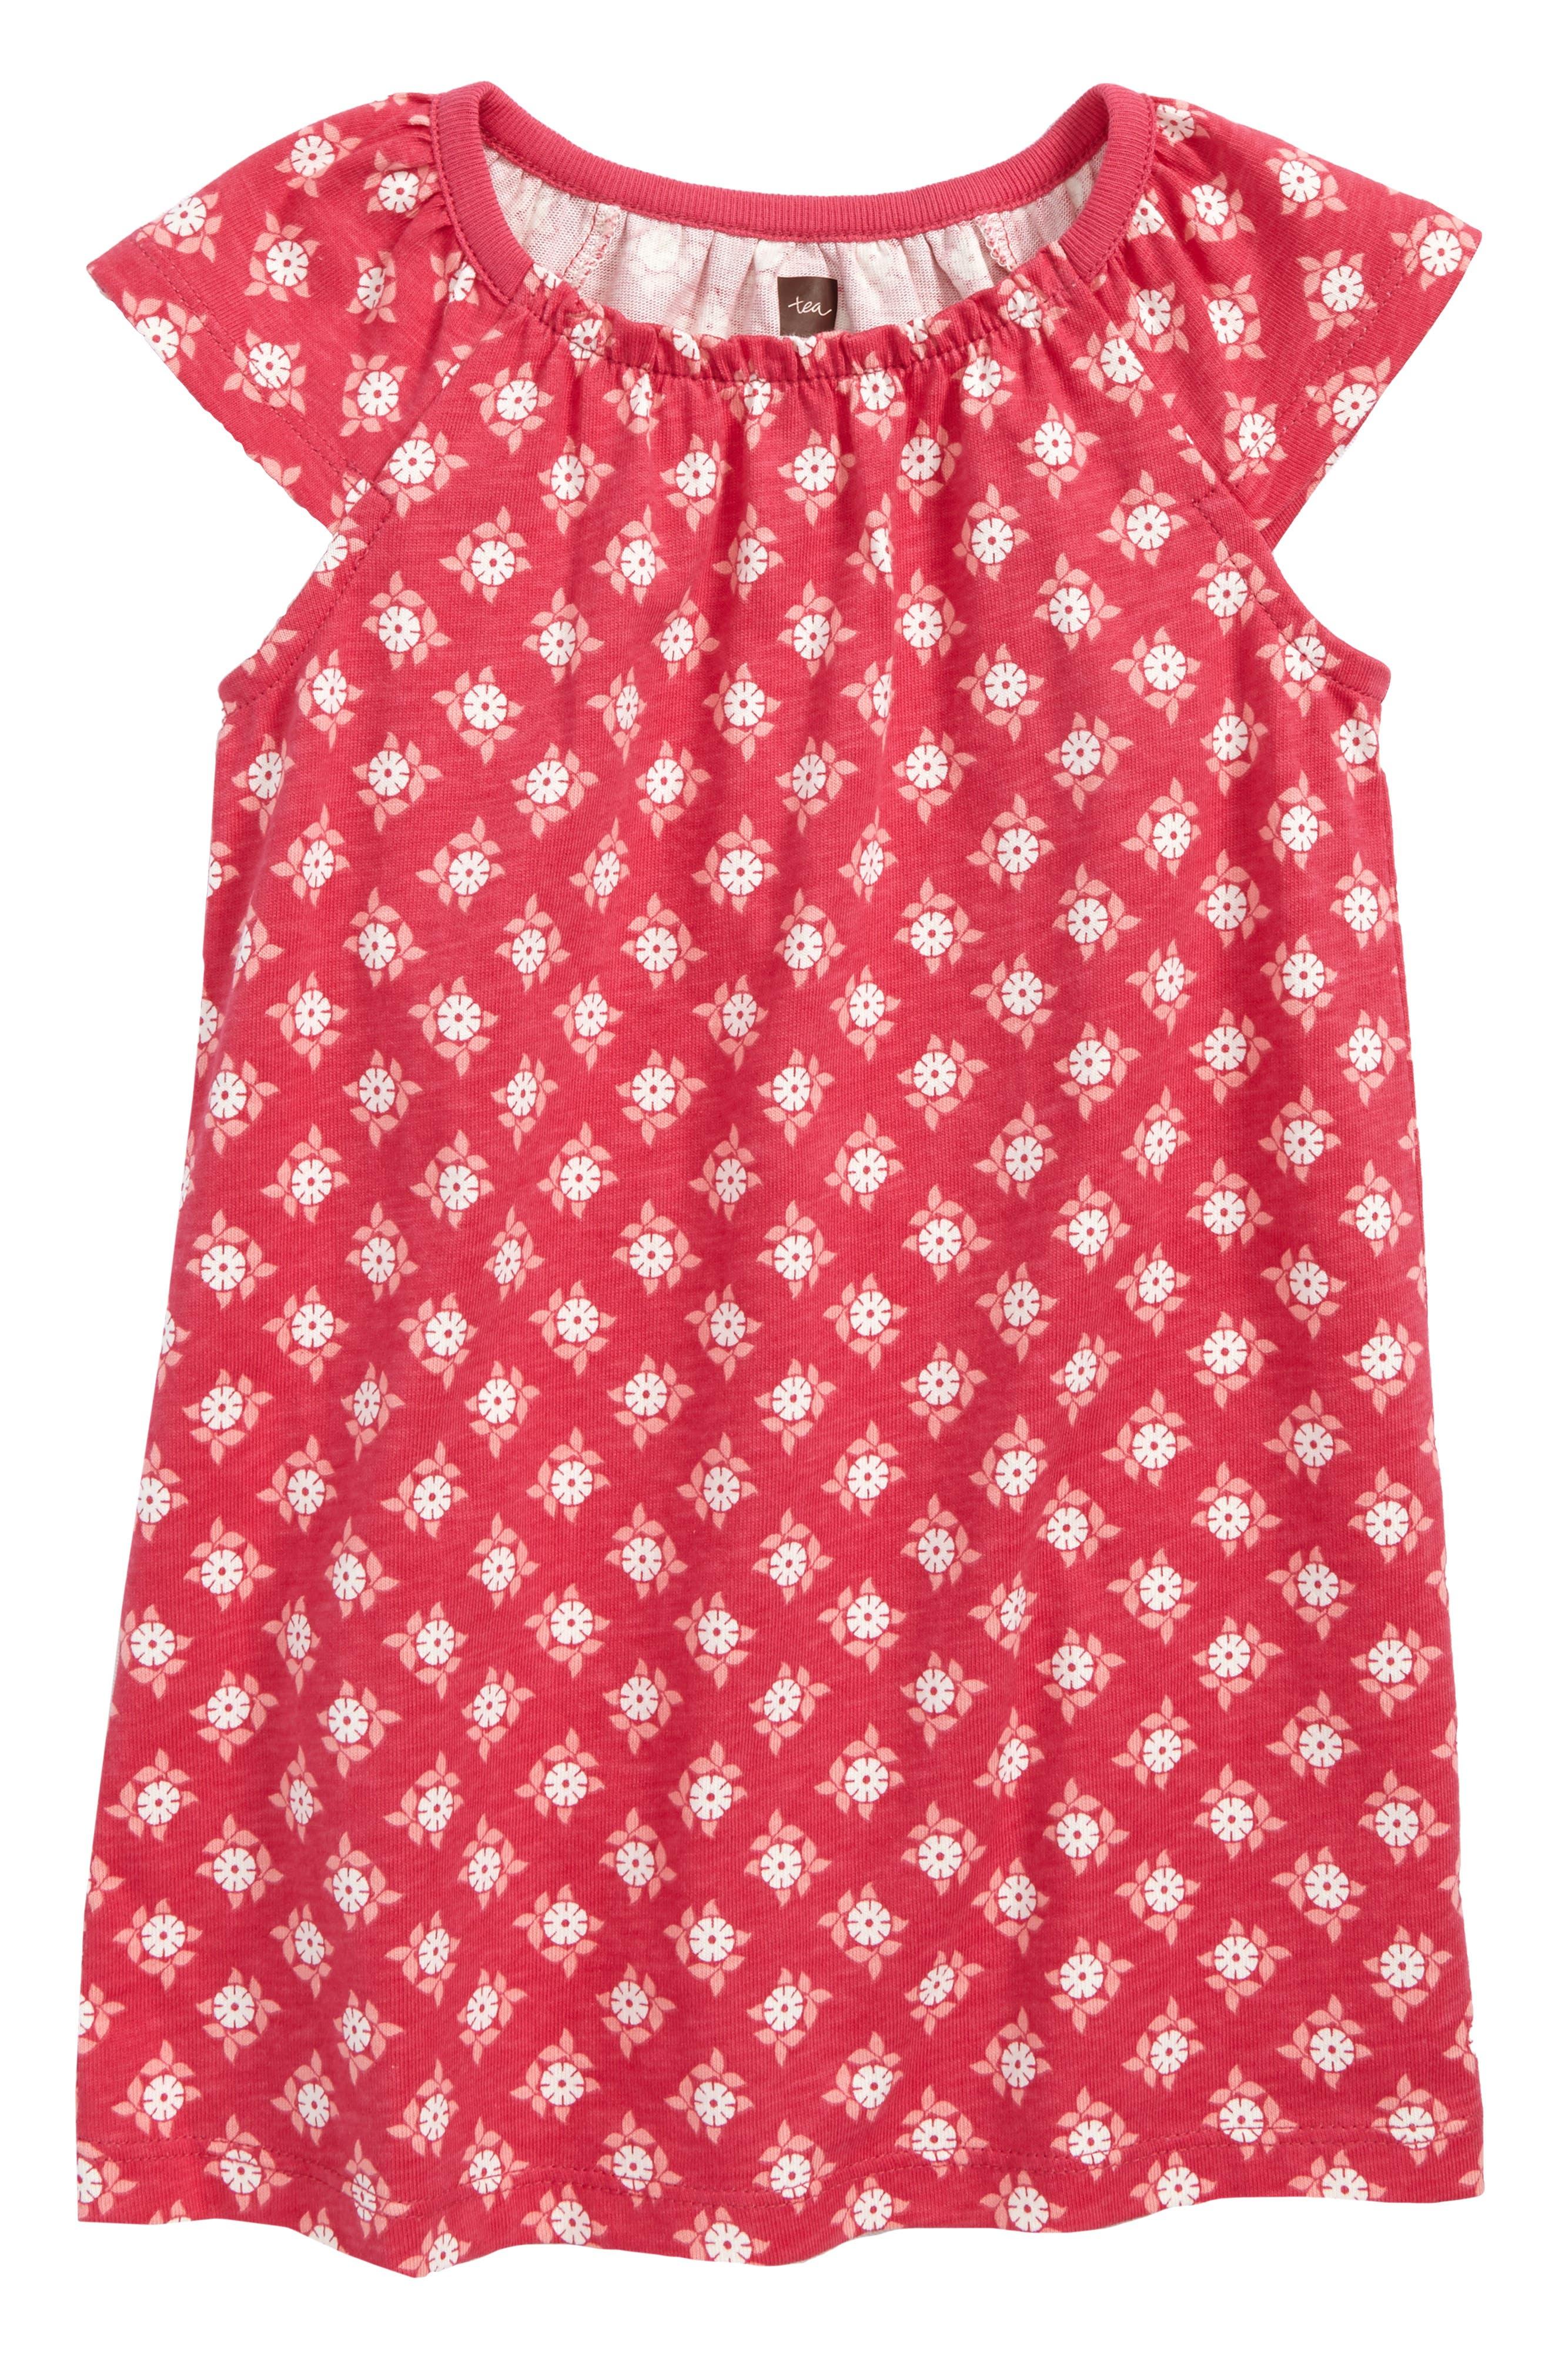 Main Image - Tea Collection Sunburst Dress (Baby Girls)